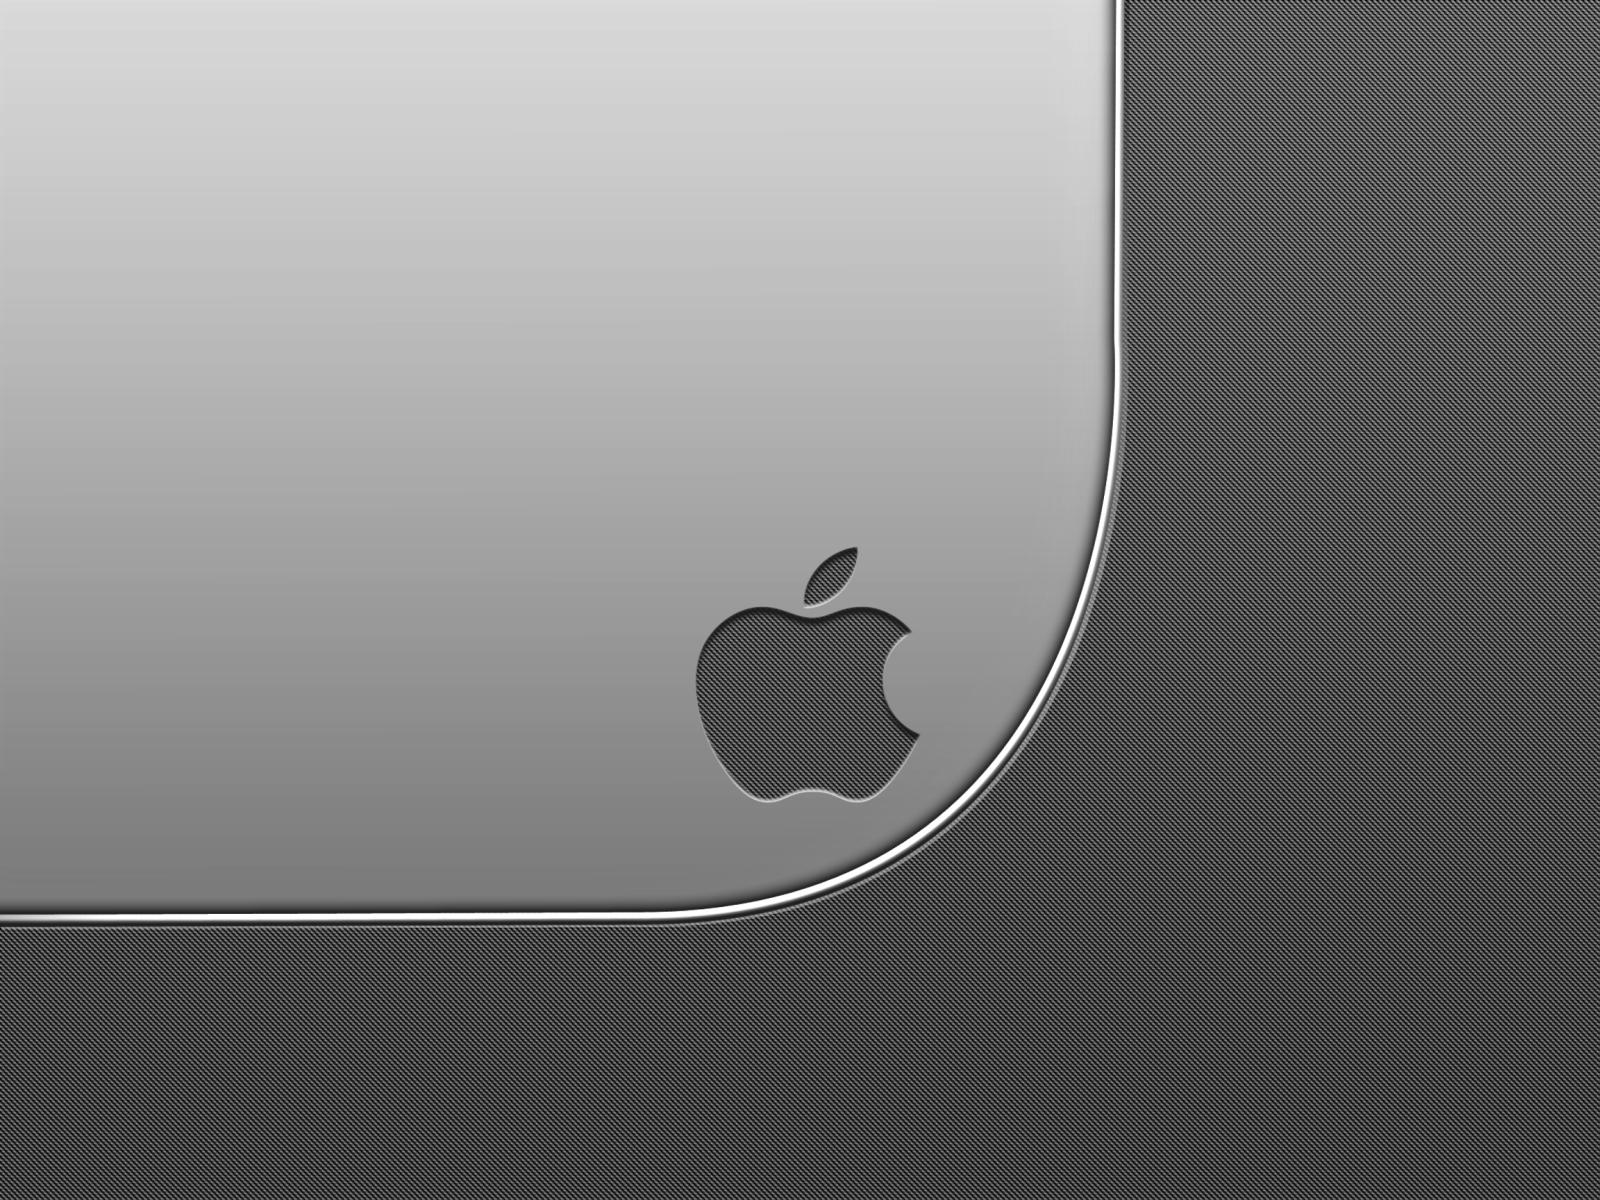 Apple Fiber